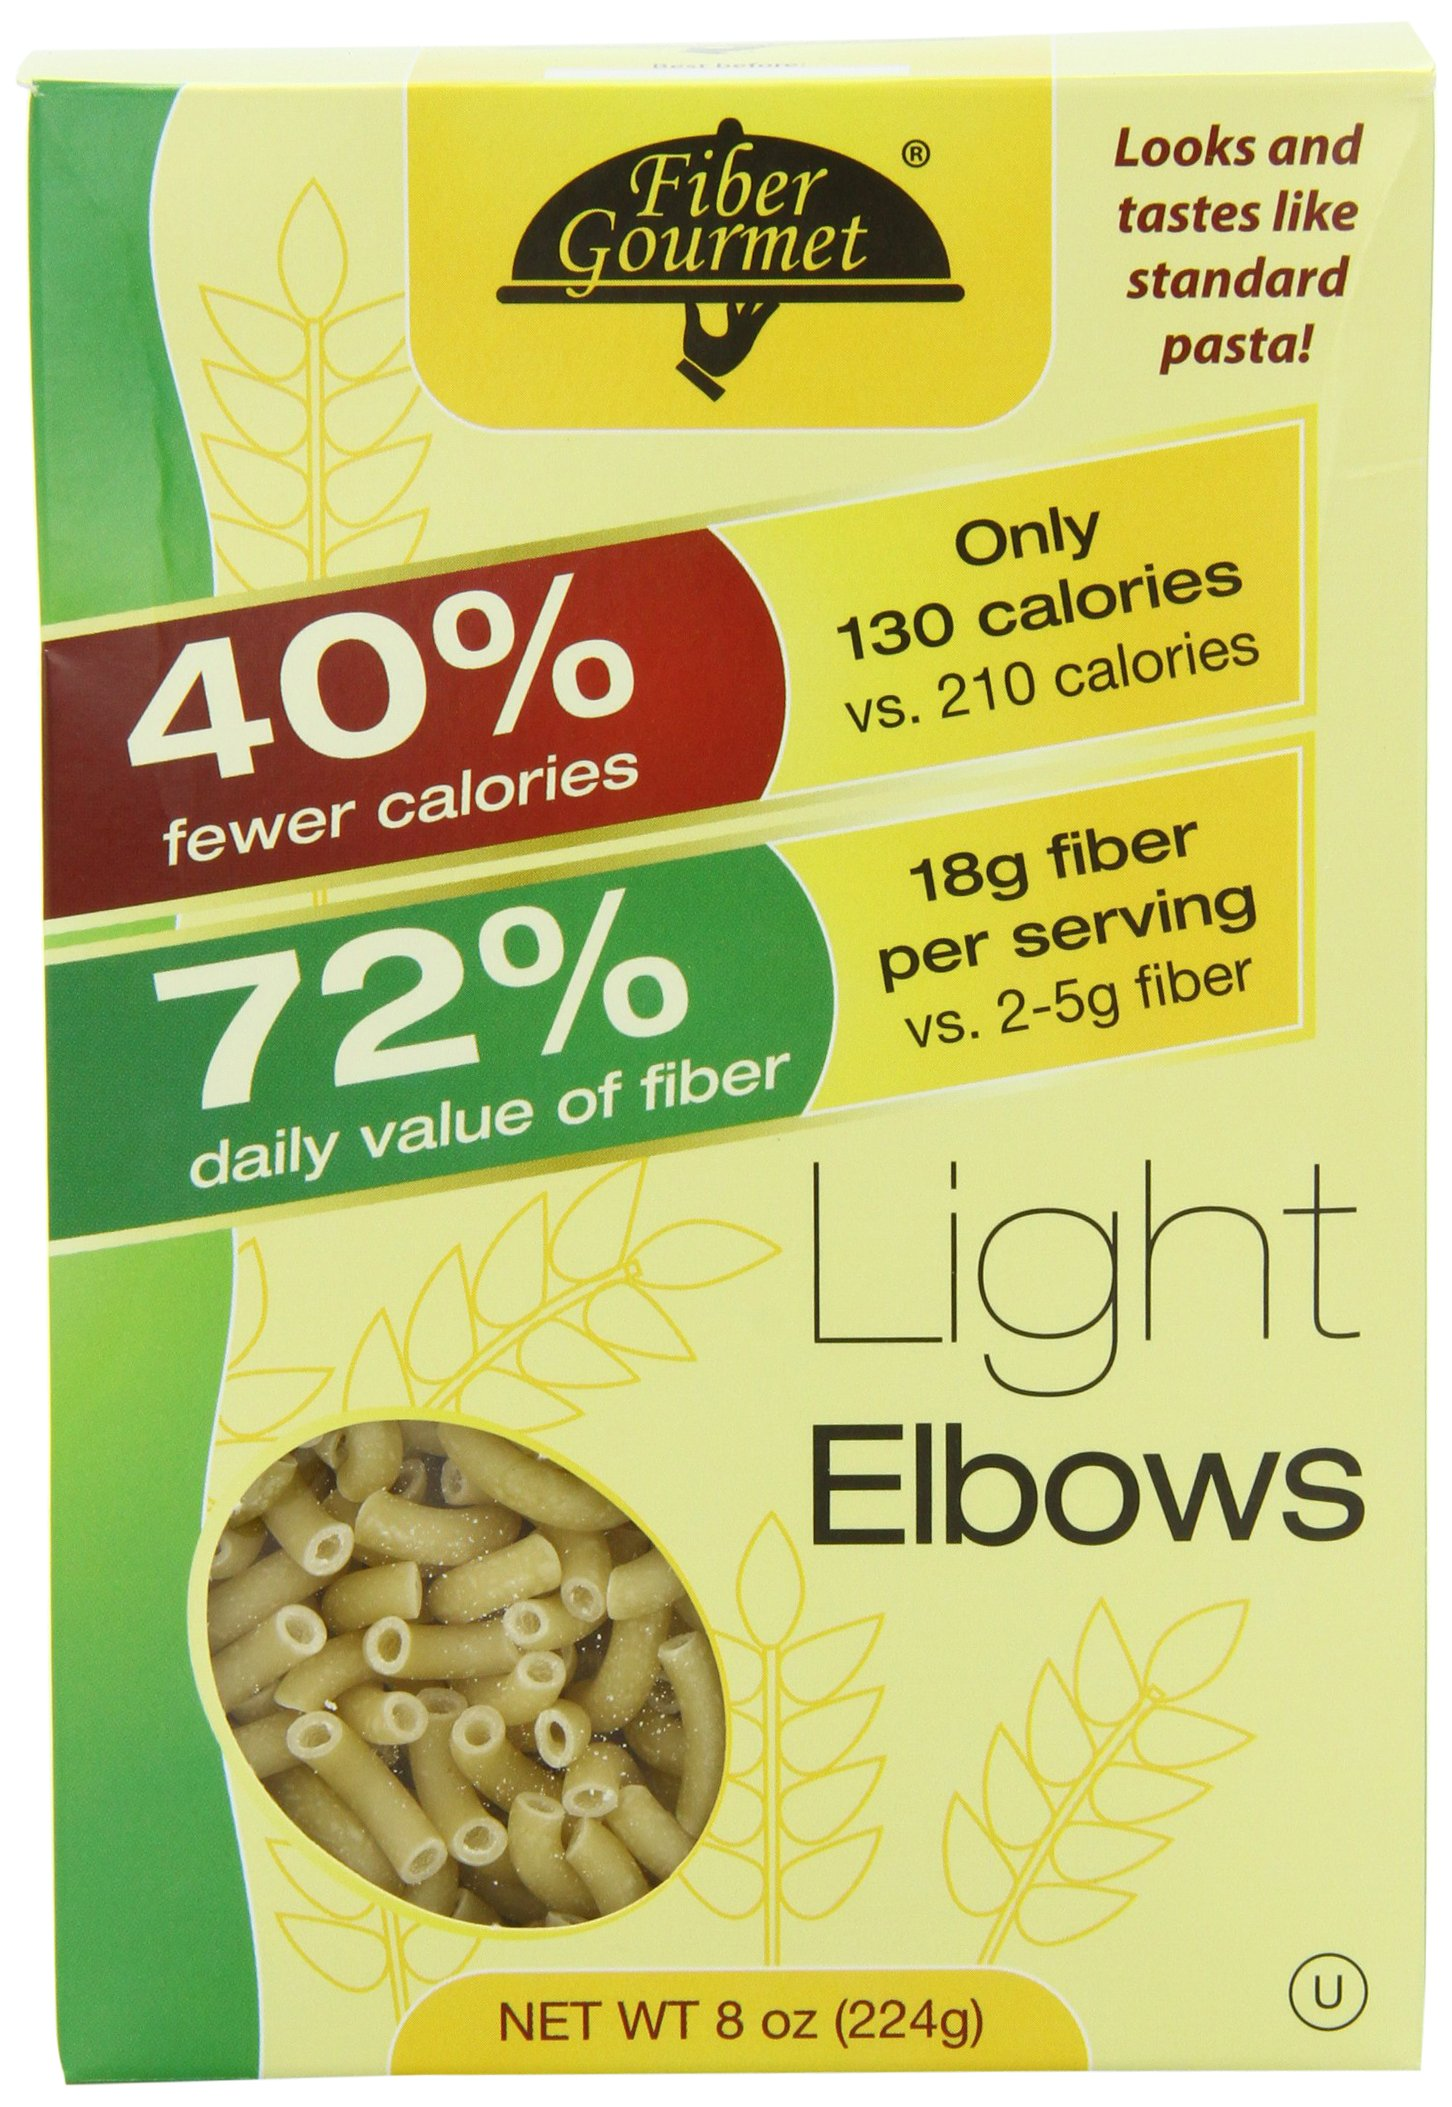 FiberGourmet Light Elbows, 8-Ounce Boxes (Pack of 6) Healthy, Low Calorie, Low Carb, High Protein (8g) 130 Calories per serving, 23 Net Carbs, 18 Grams Fiber, Just 3 SP, Vegan by Fiber Gourmet